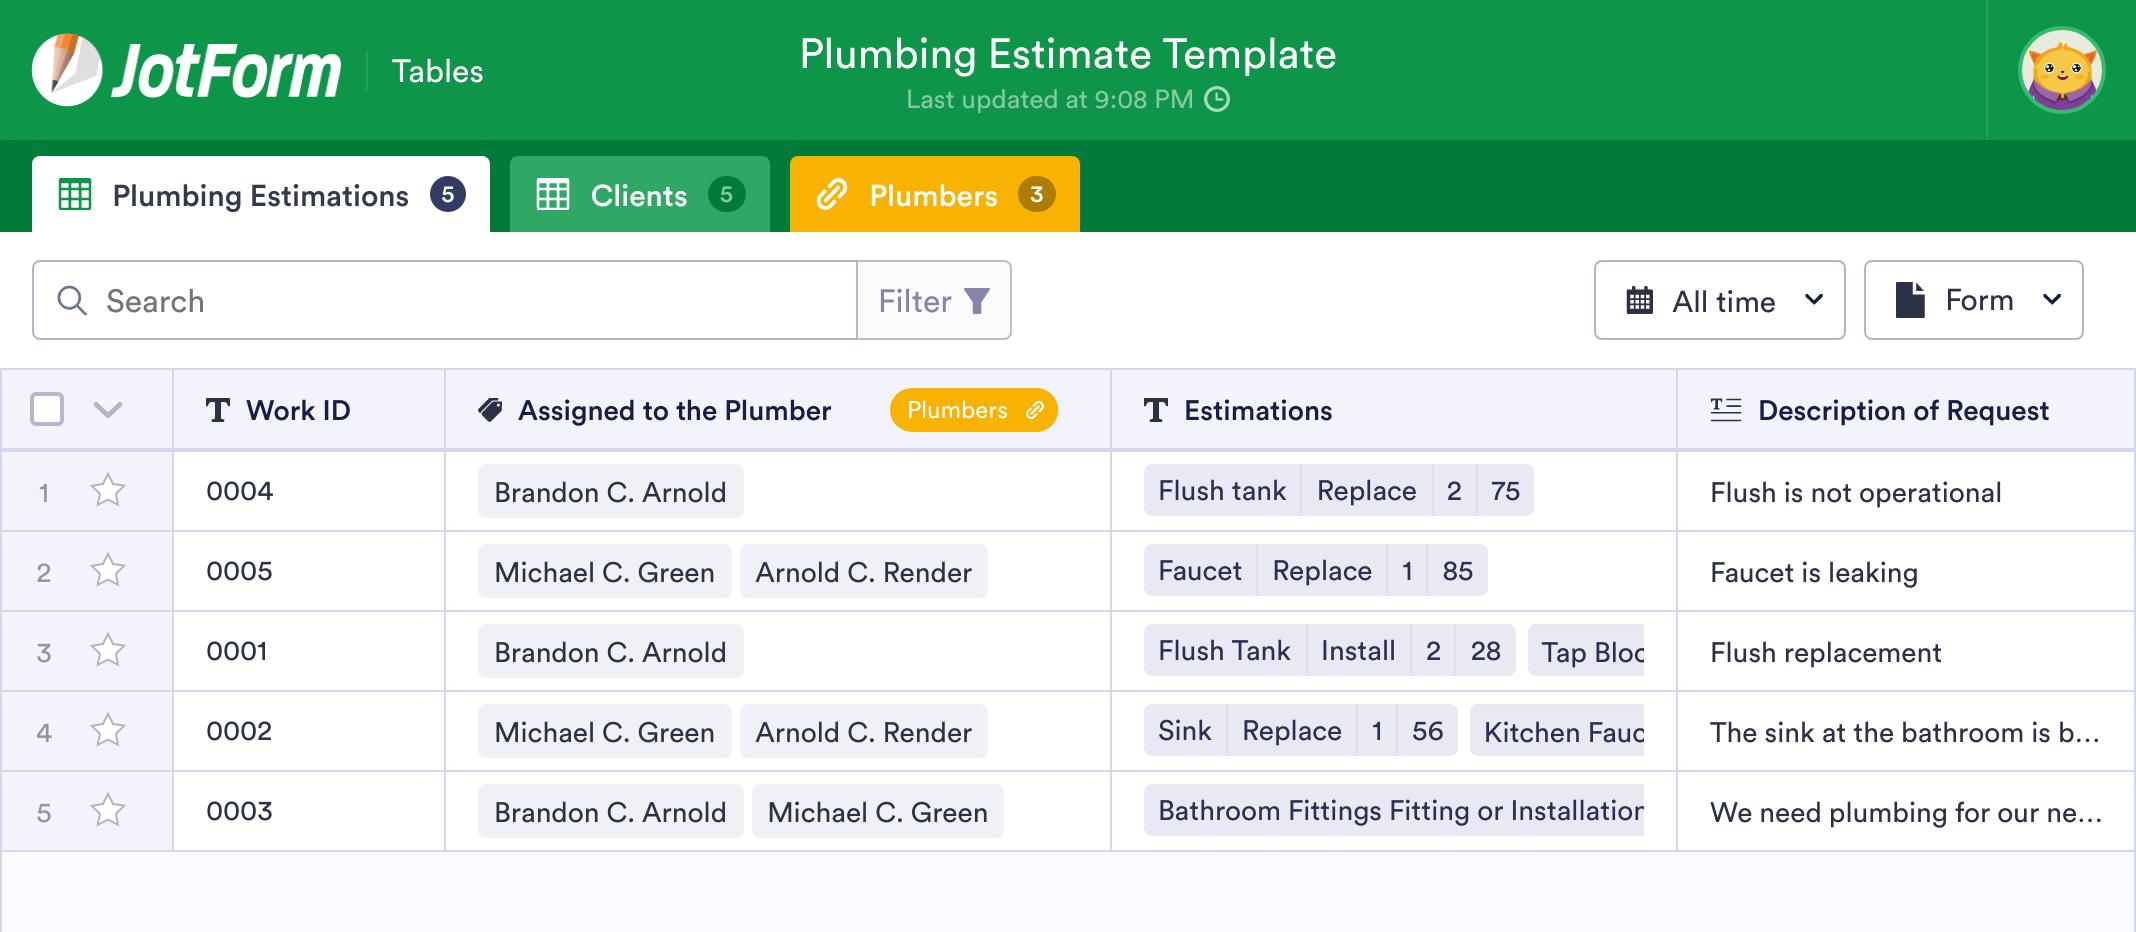 Plumbing Estimate Template